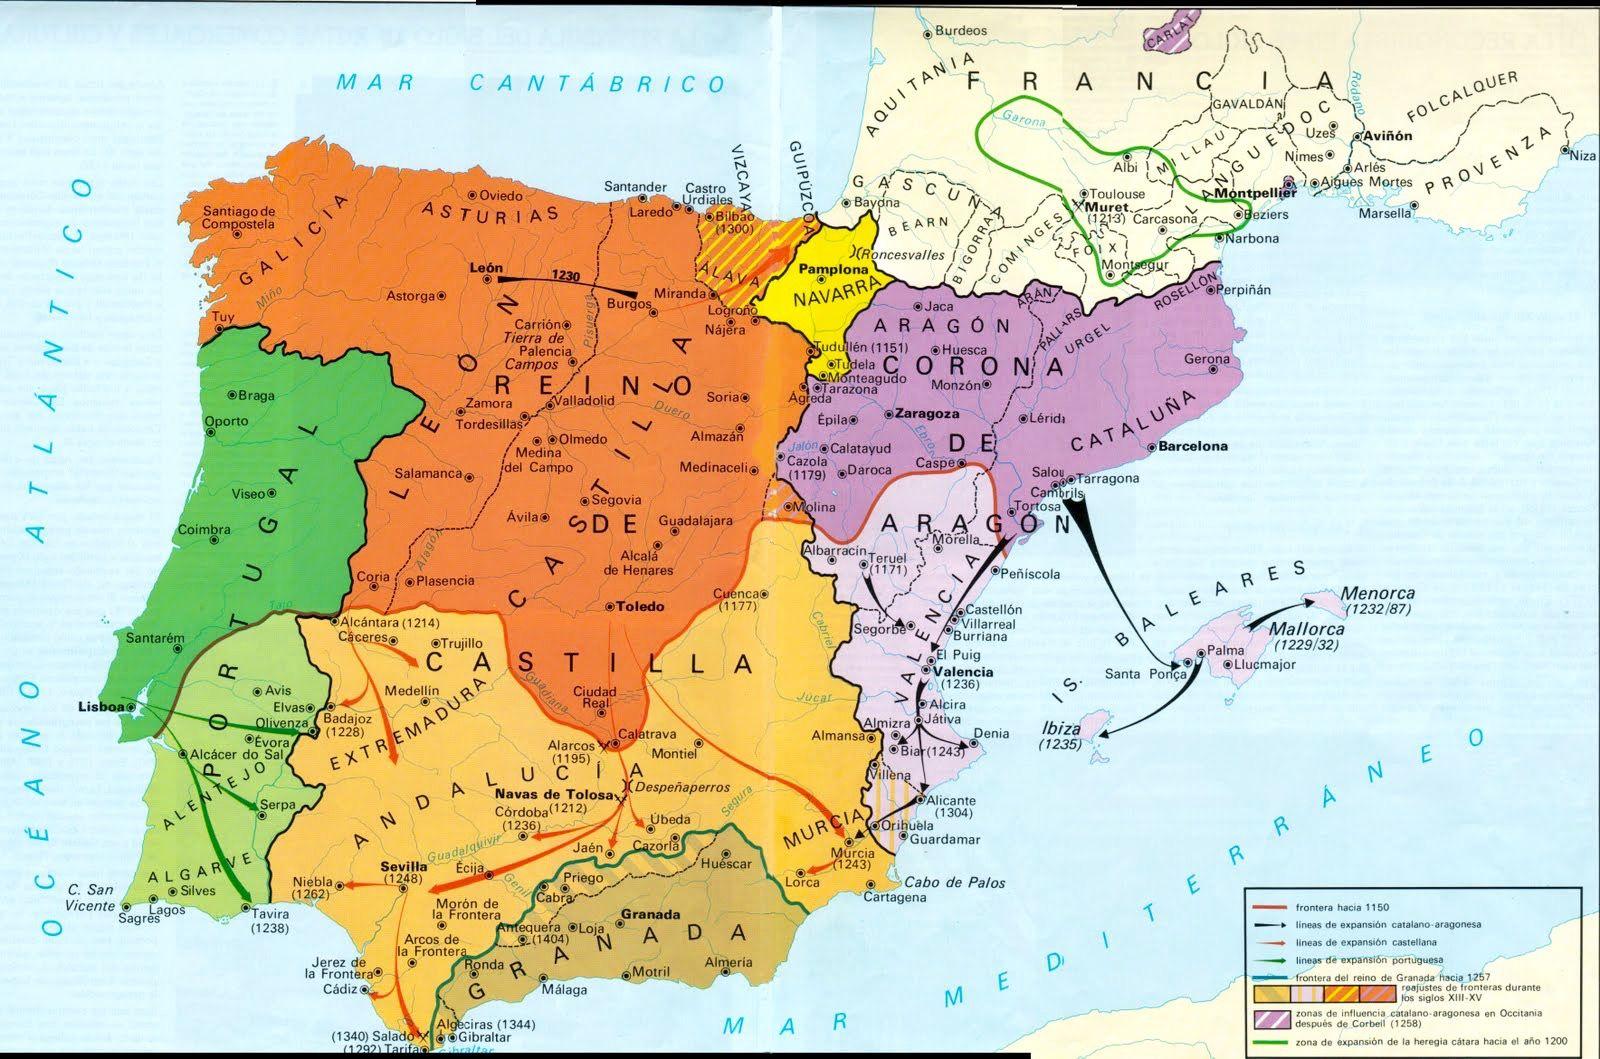 Mapa España Siglo Xv.Peninsula Iberica Conquistas Cristianas De Los Siglos Xiii